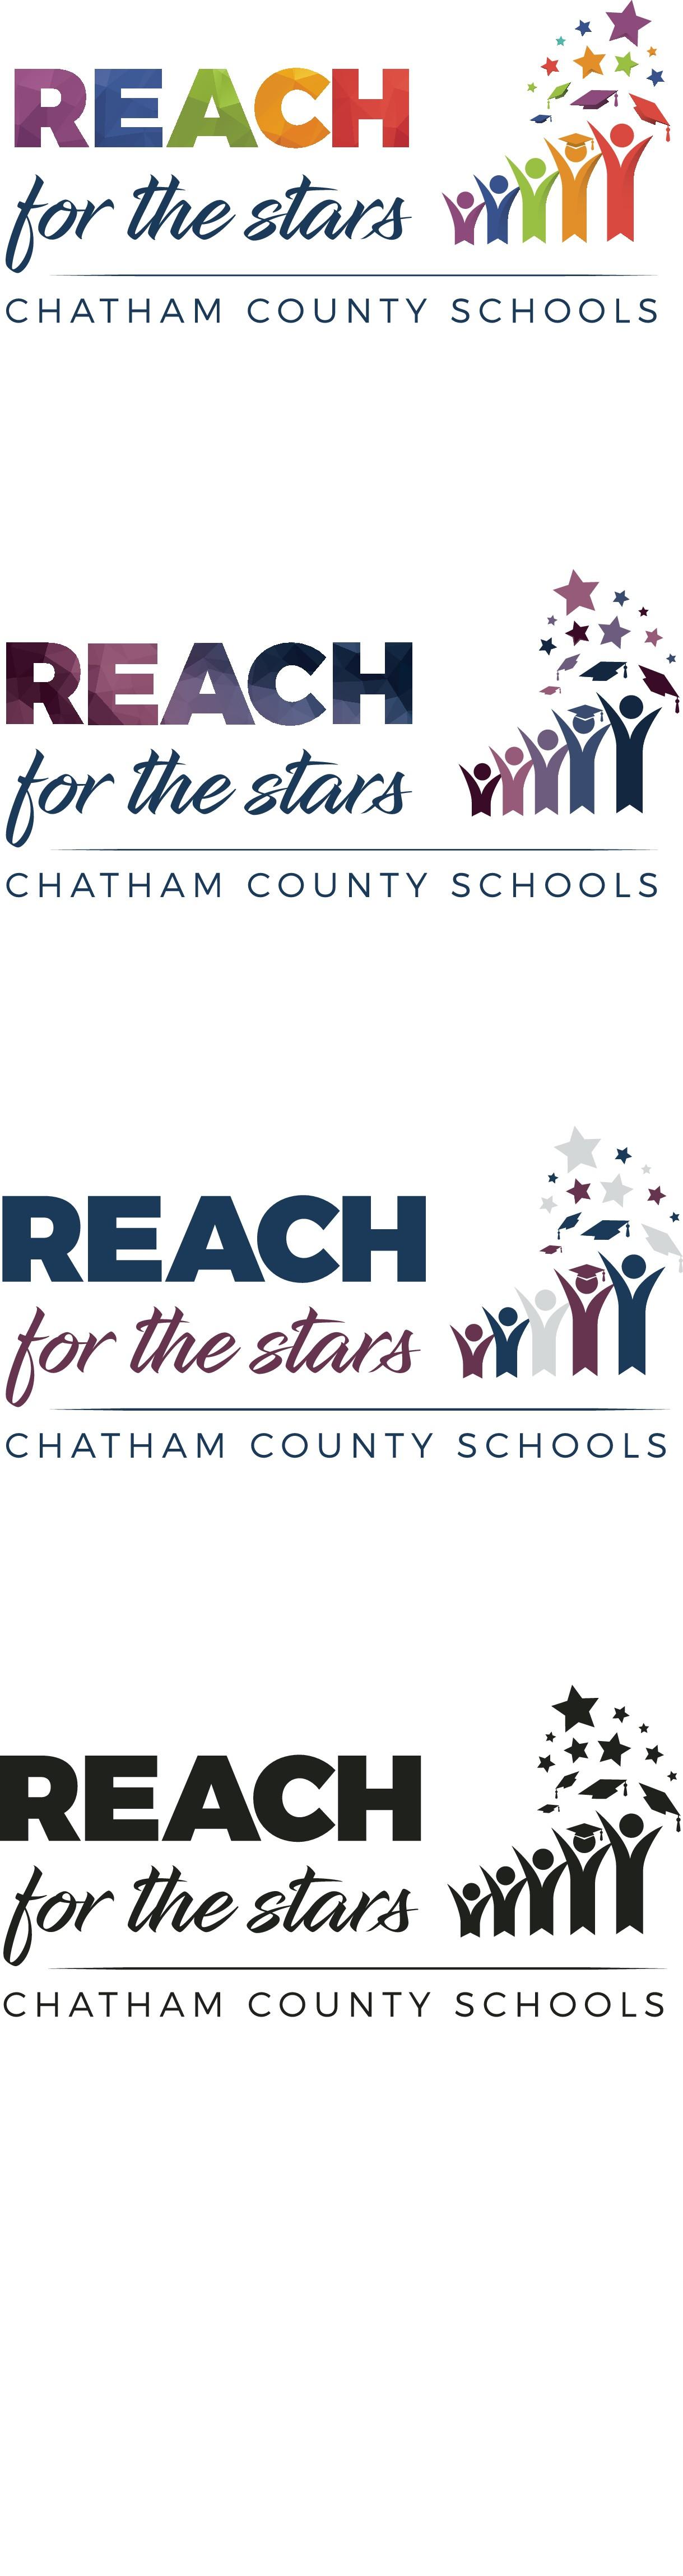 reach for the stars - logo